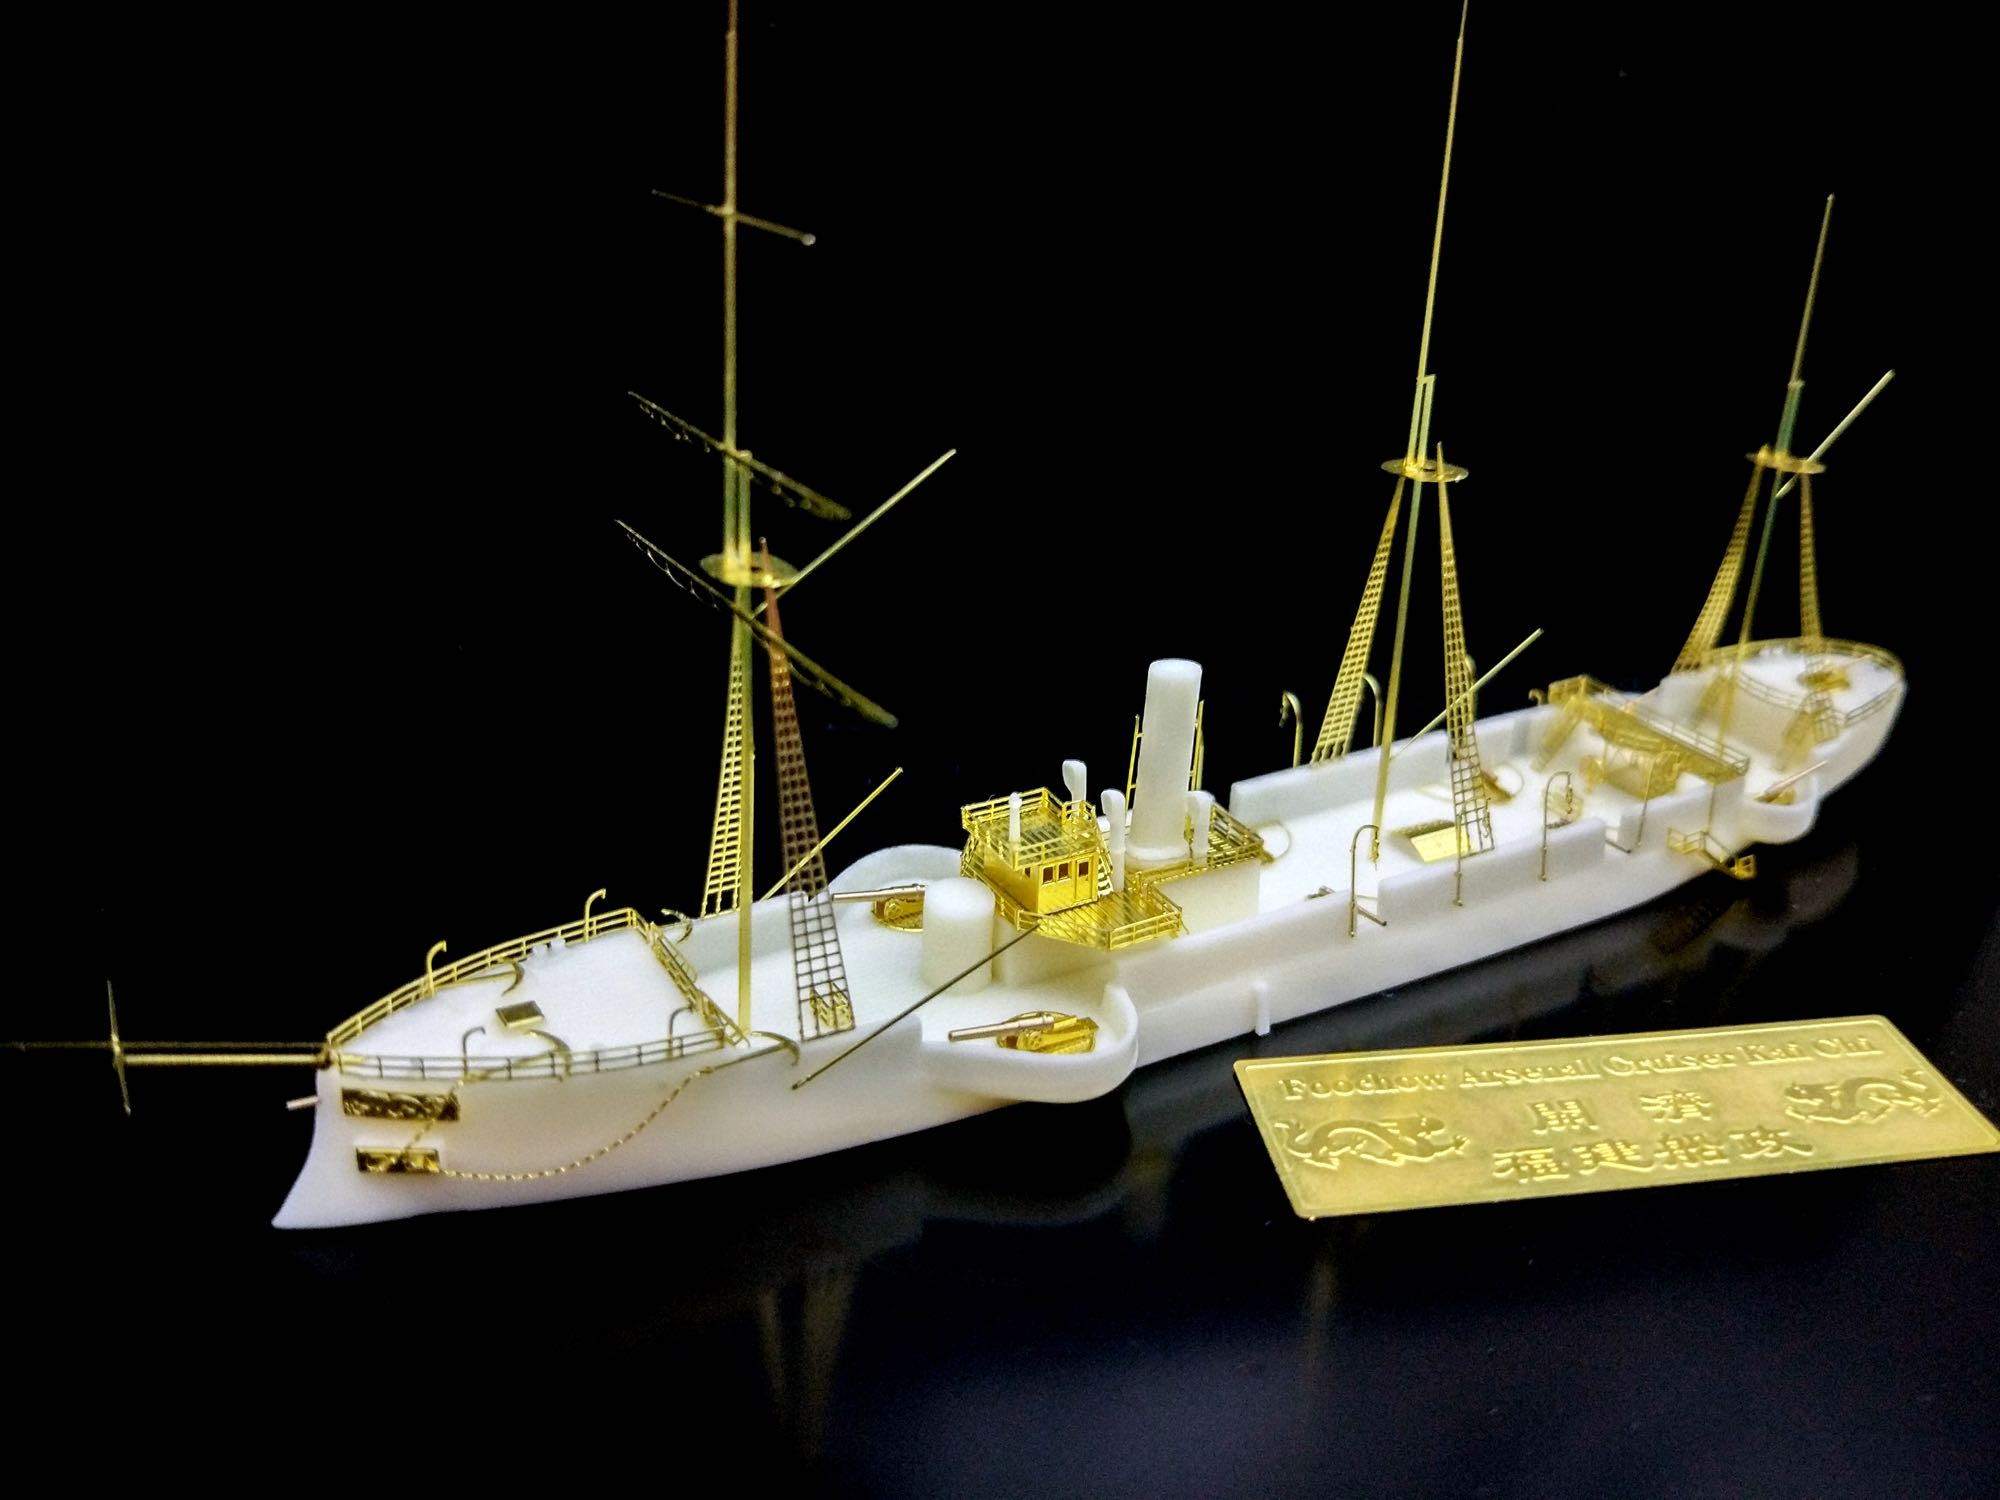 WM03121 大清福建船政 开济巡洋舰1:700树脂模型 含PE和金属炮管